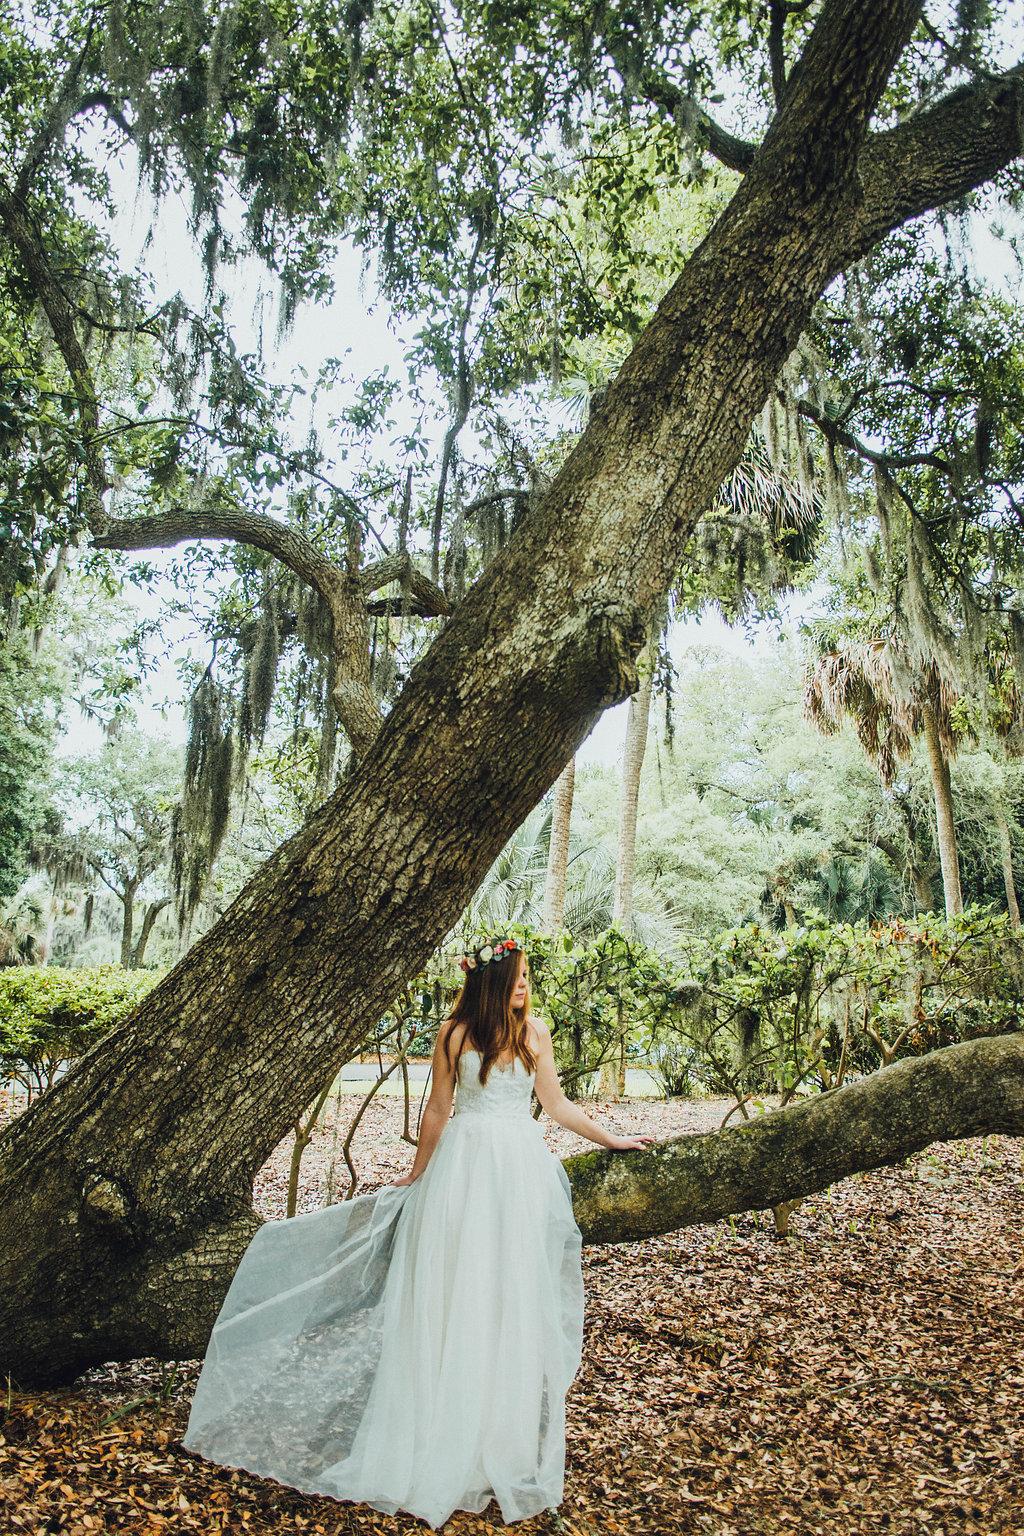 Urban-Poppy-Southern-Wedding-Mallory-and-Justin-photography-ivory-and-beau-bridal-boutique-sarah-seven-marion-boho-bride-indie-bride-indie-wedding-dress-savannah-weddings-hilton-head-weddings-beach-wedding-10.jpg